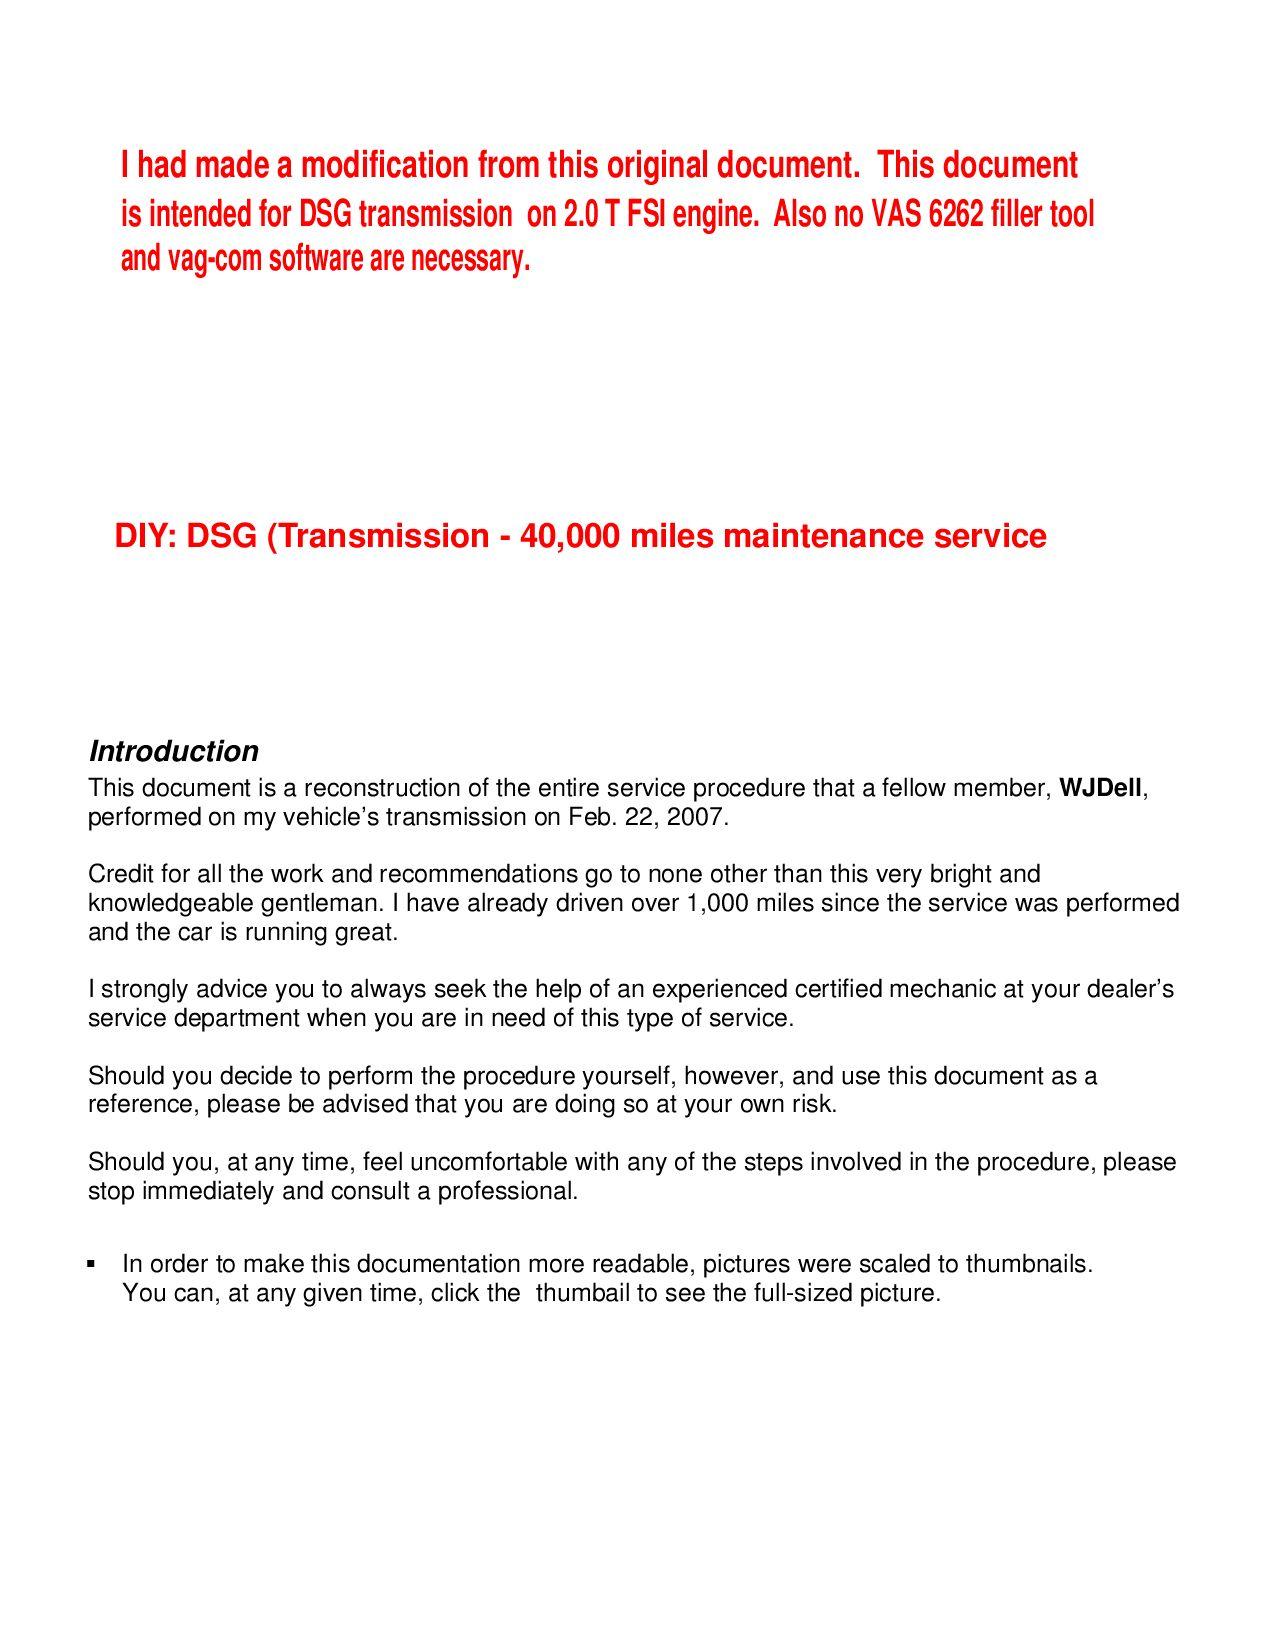 DIY: DSG (Transmission - 40,000 miles maintenance service by